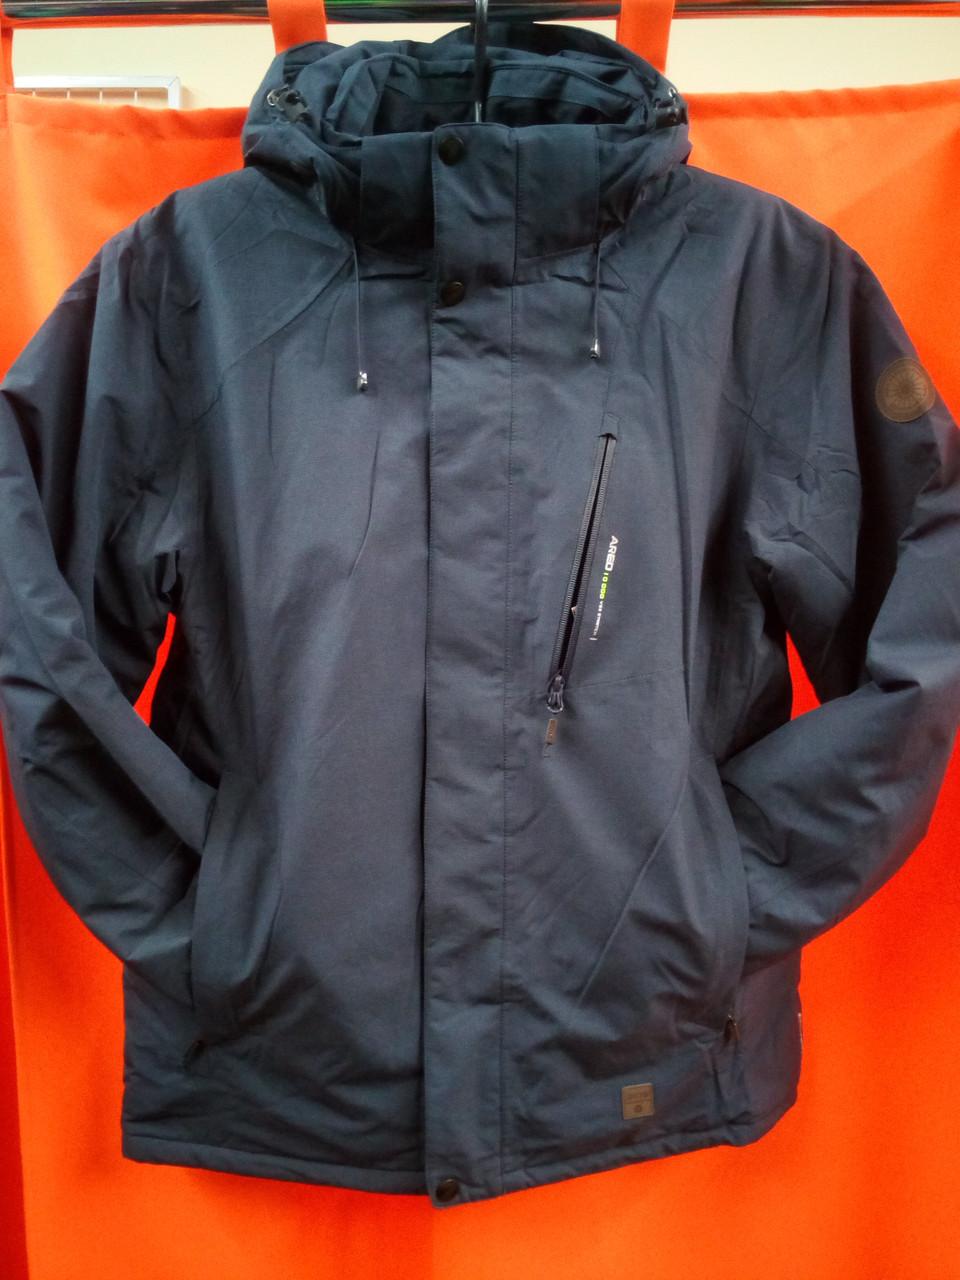 32a8029231104 Мужская горнолыжная куртка Snow Headquarter батал - Про100Спорт в Сумах